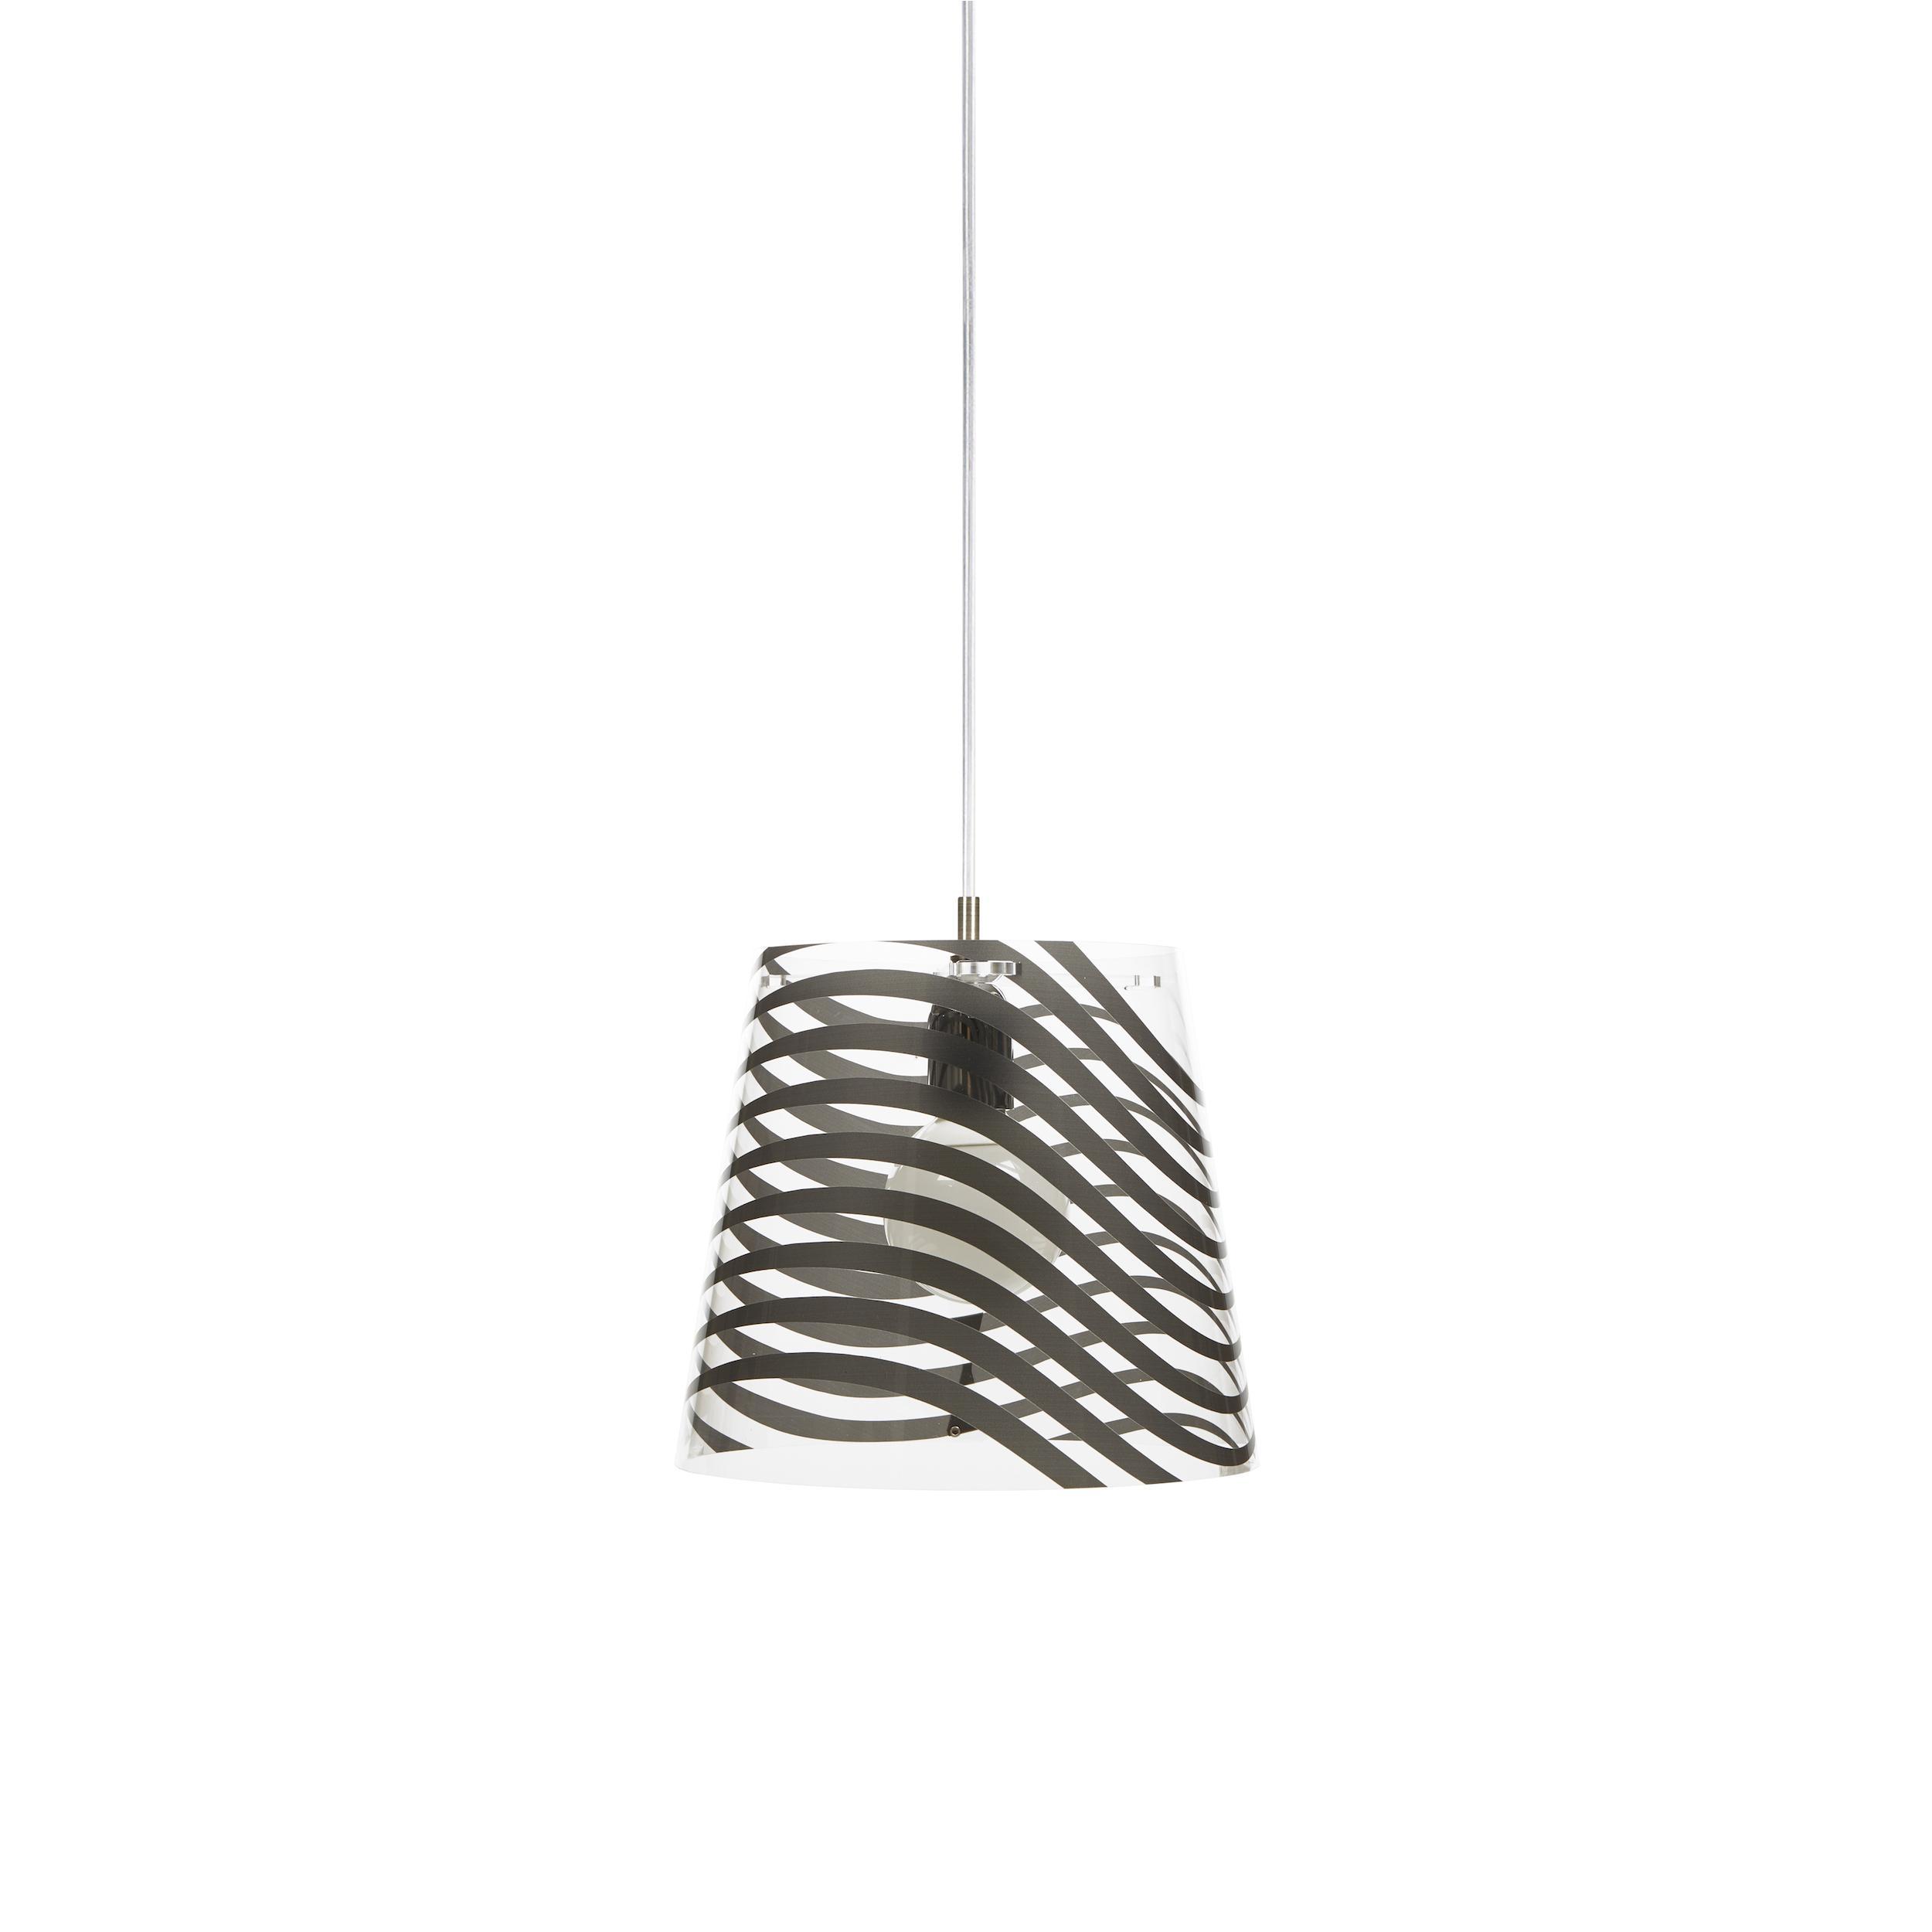 Sospensione lampadario con paralume in policarbonato